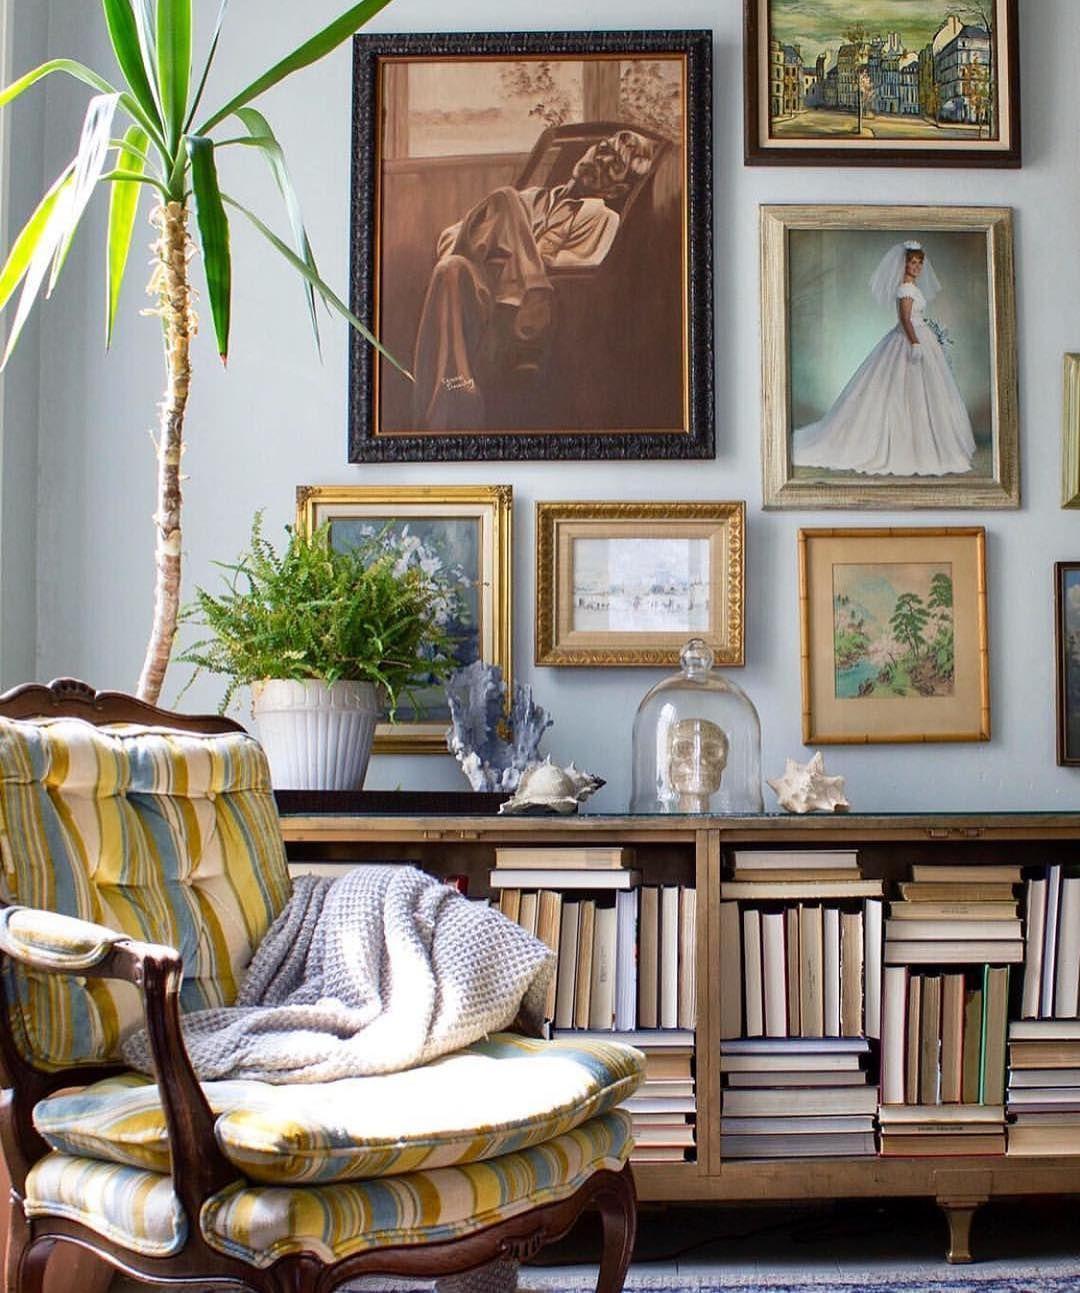 Pin de Jana H en furniture/furnishings | Pinterest | Marcos de ...